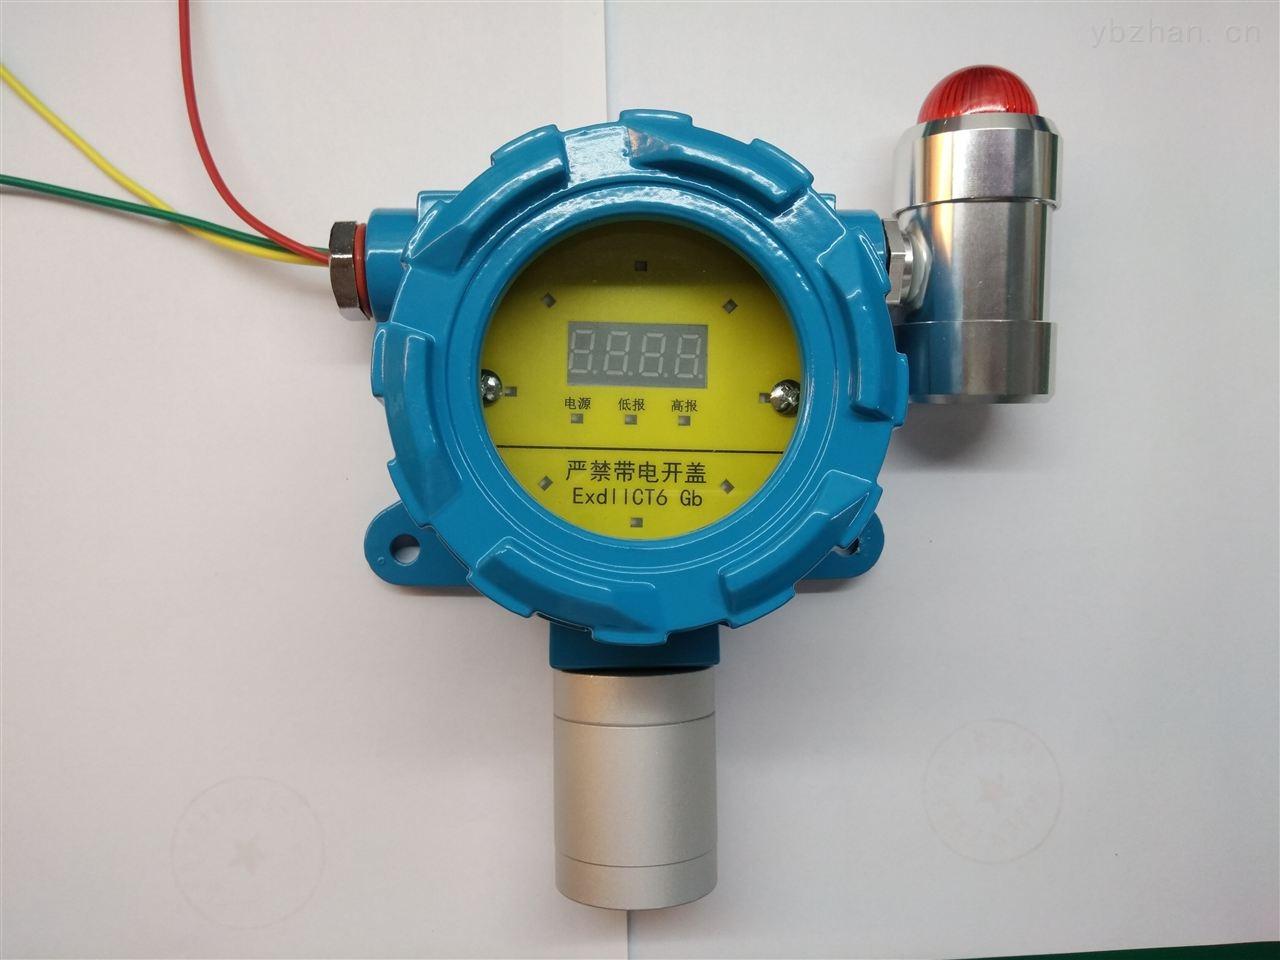 HRP-T1000-汇瑞埔有毒气体泄漏检测二氧化碳报警仪